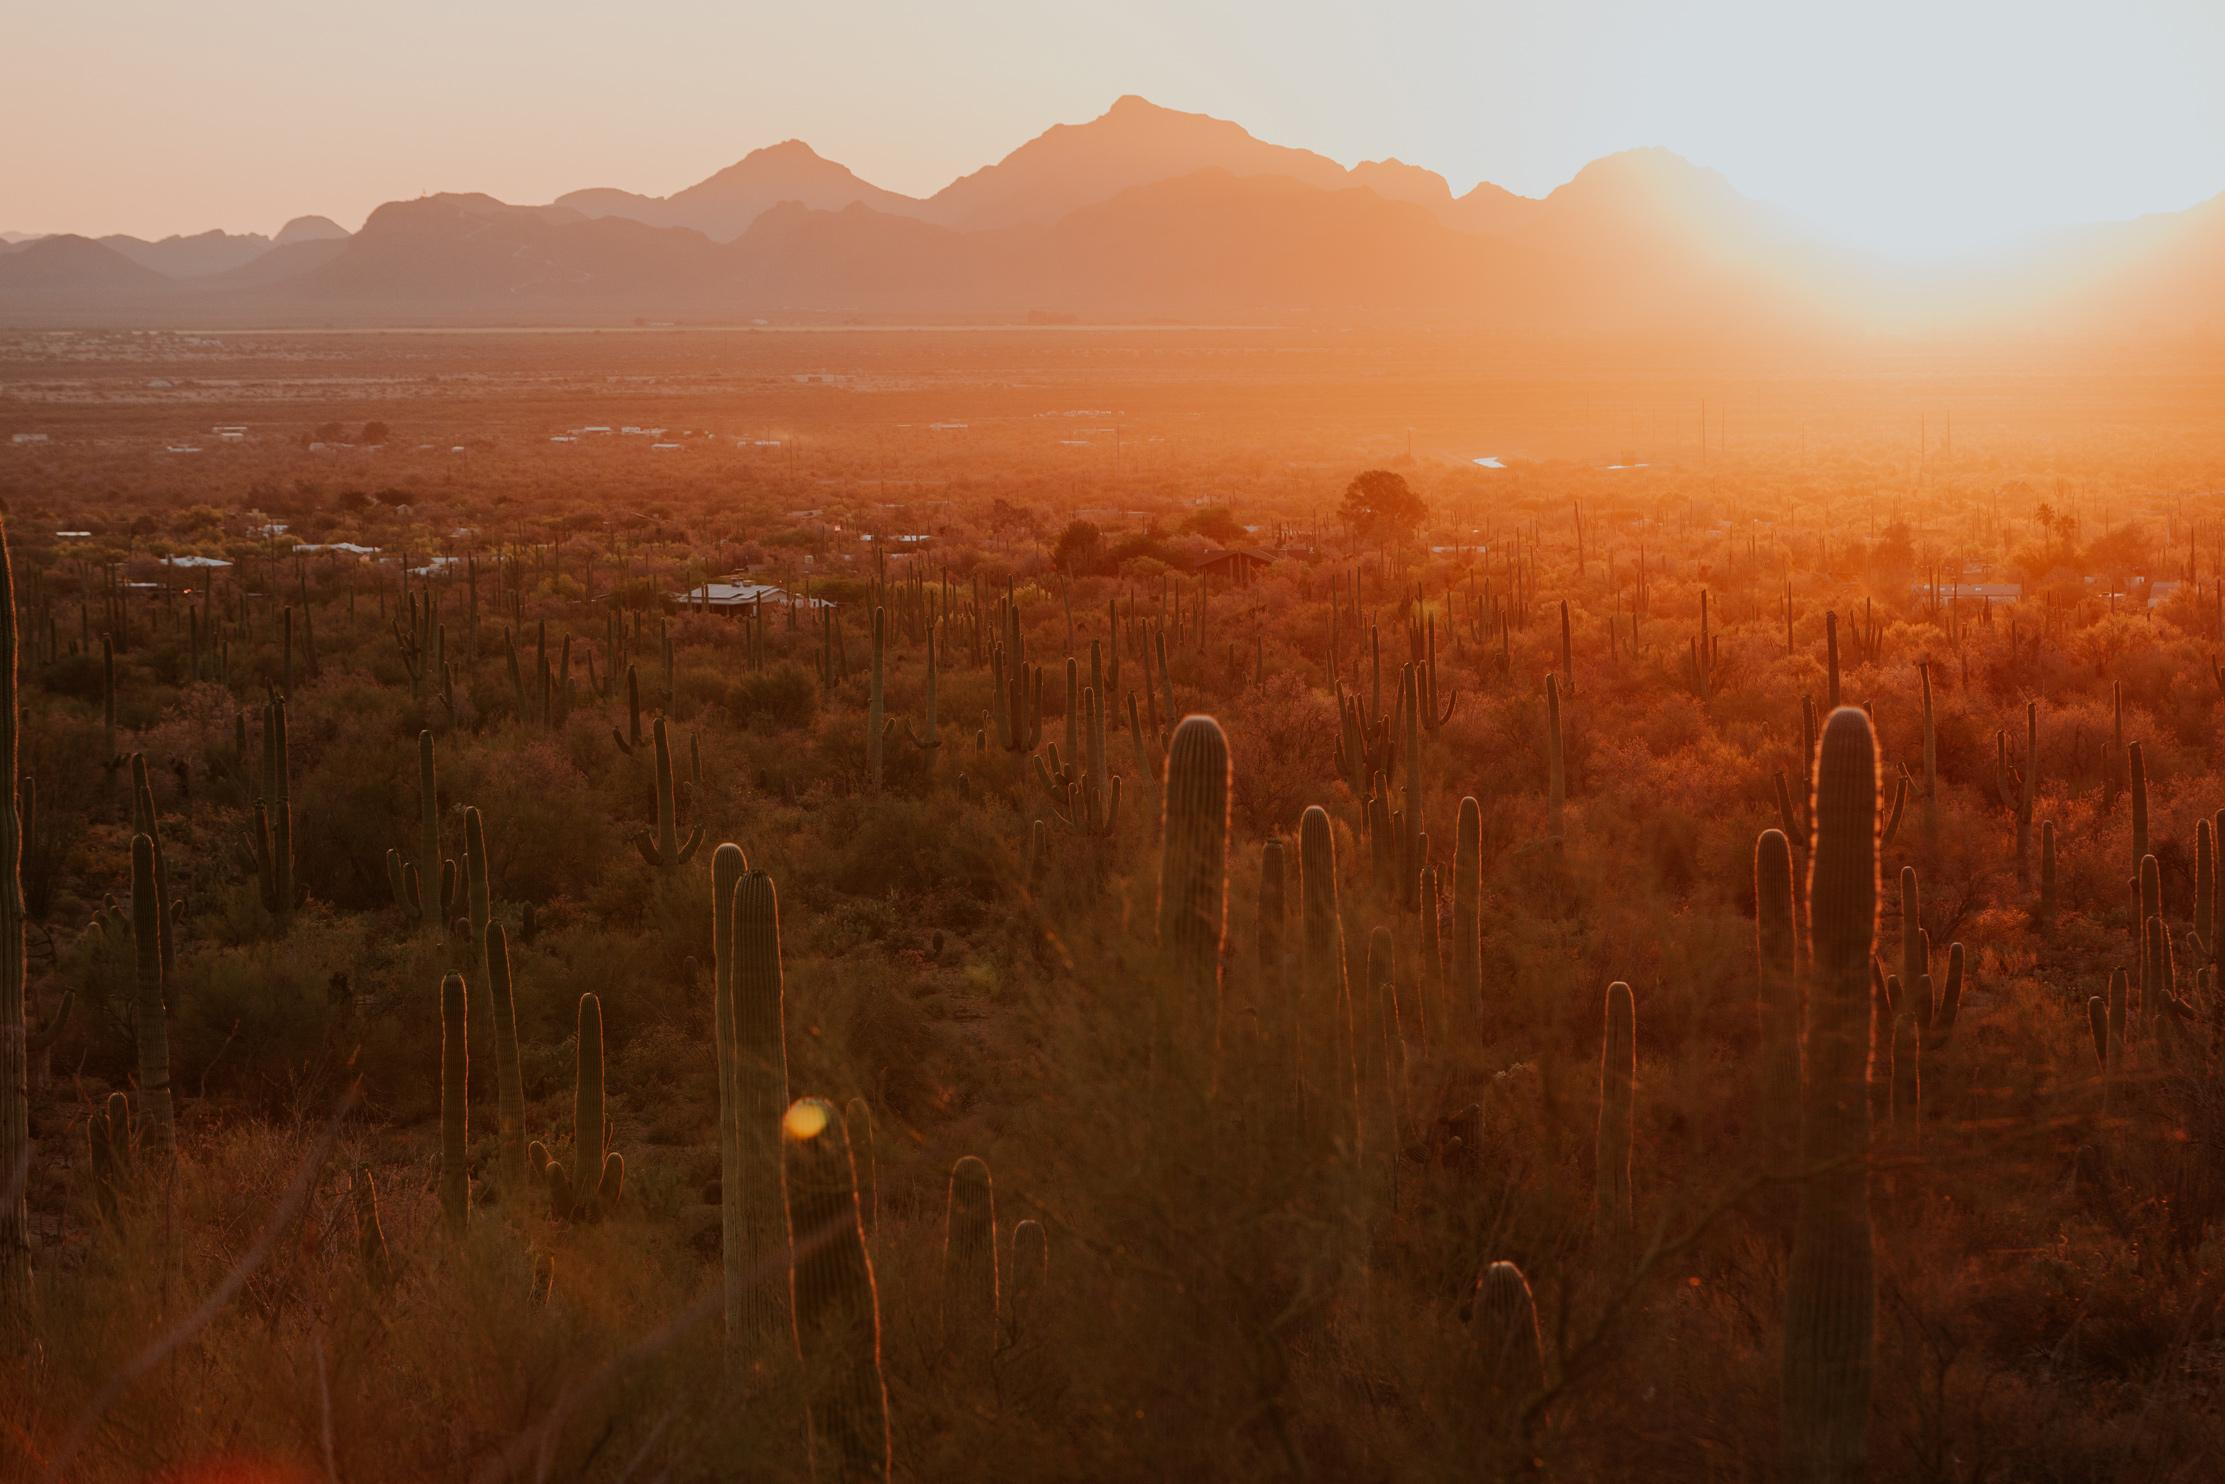 CindyGiovagnoli_Tucson_Arizona_Saguaro_National_Park_cactus_sunset_blooming_spring_sunset_petroglyphs_Native_American_indigenous-017.jpg